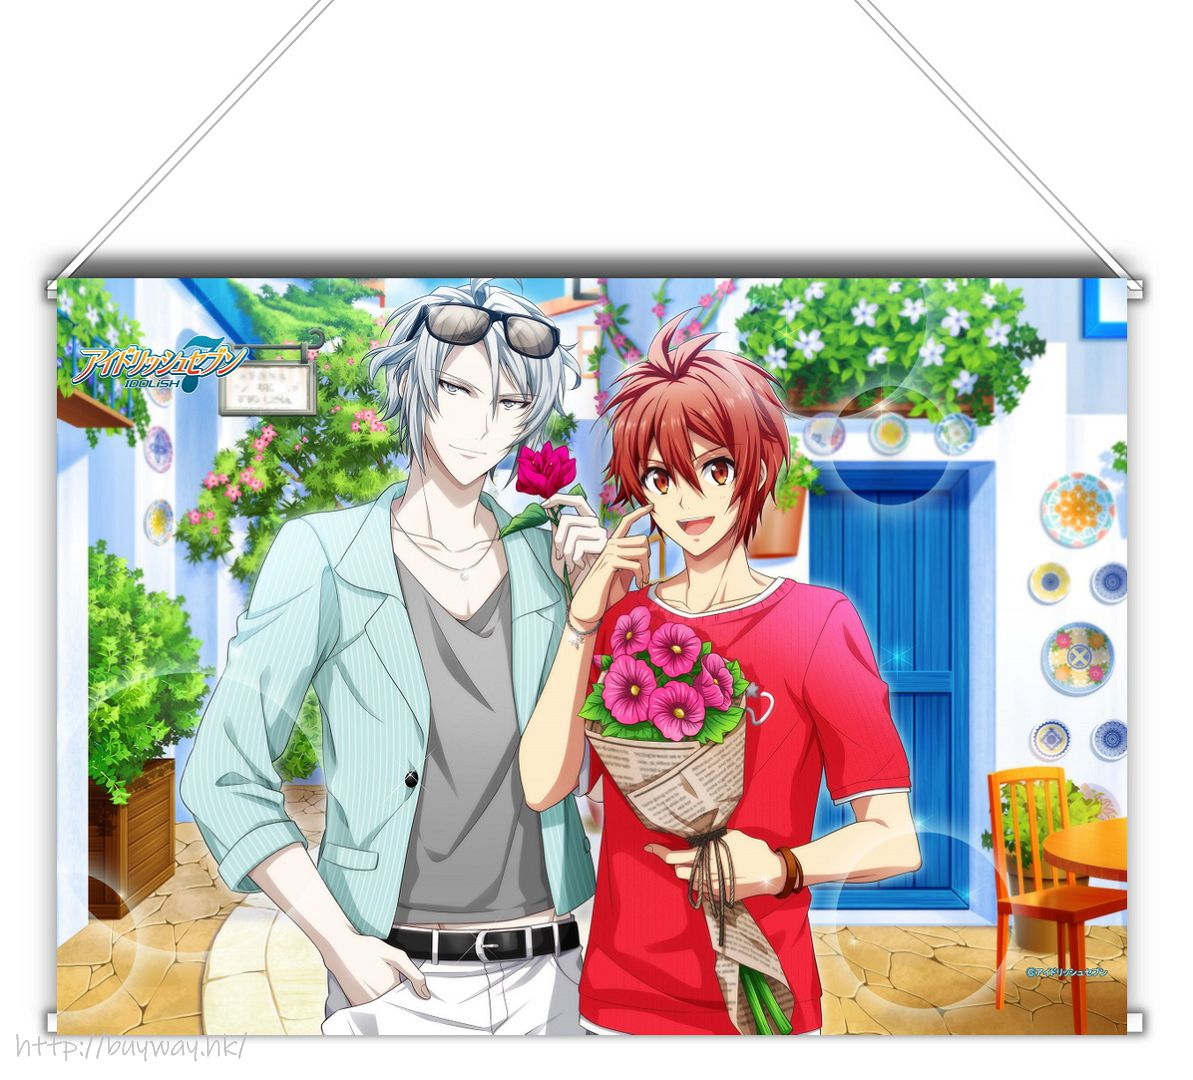 IDOLiSH7 「八乙女樂 + 七瀨陸」Shuffle Talk2 B3 掛布 Shuffle Talk 2 B3 Tapestry Gaku & Riku【IDOLiSH7】